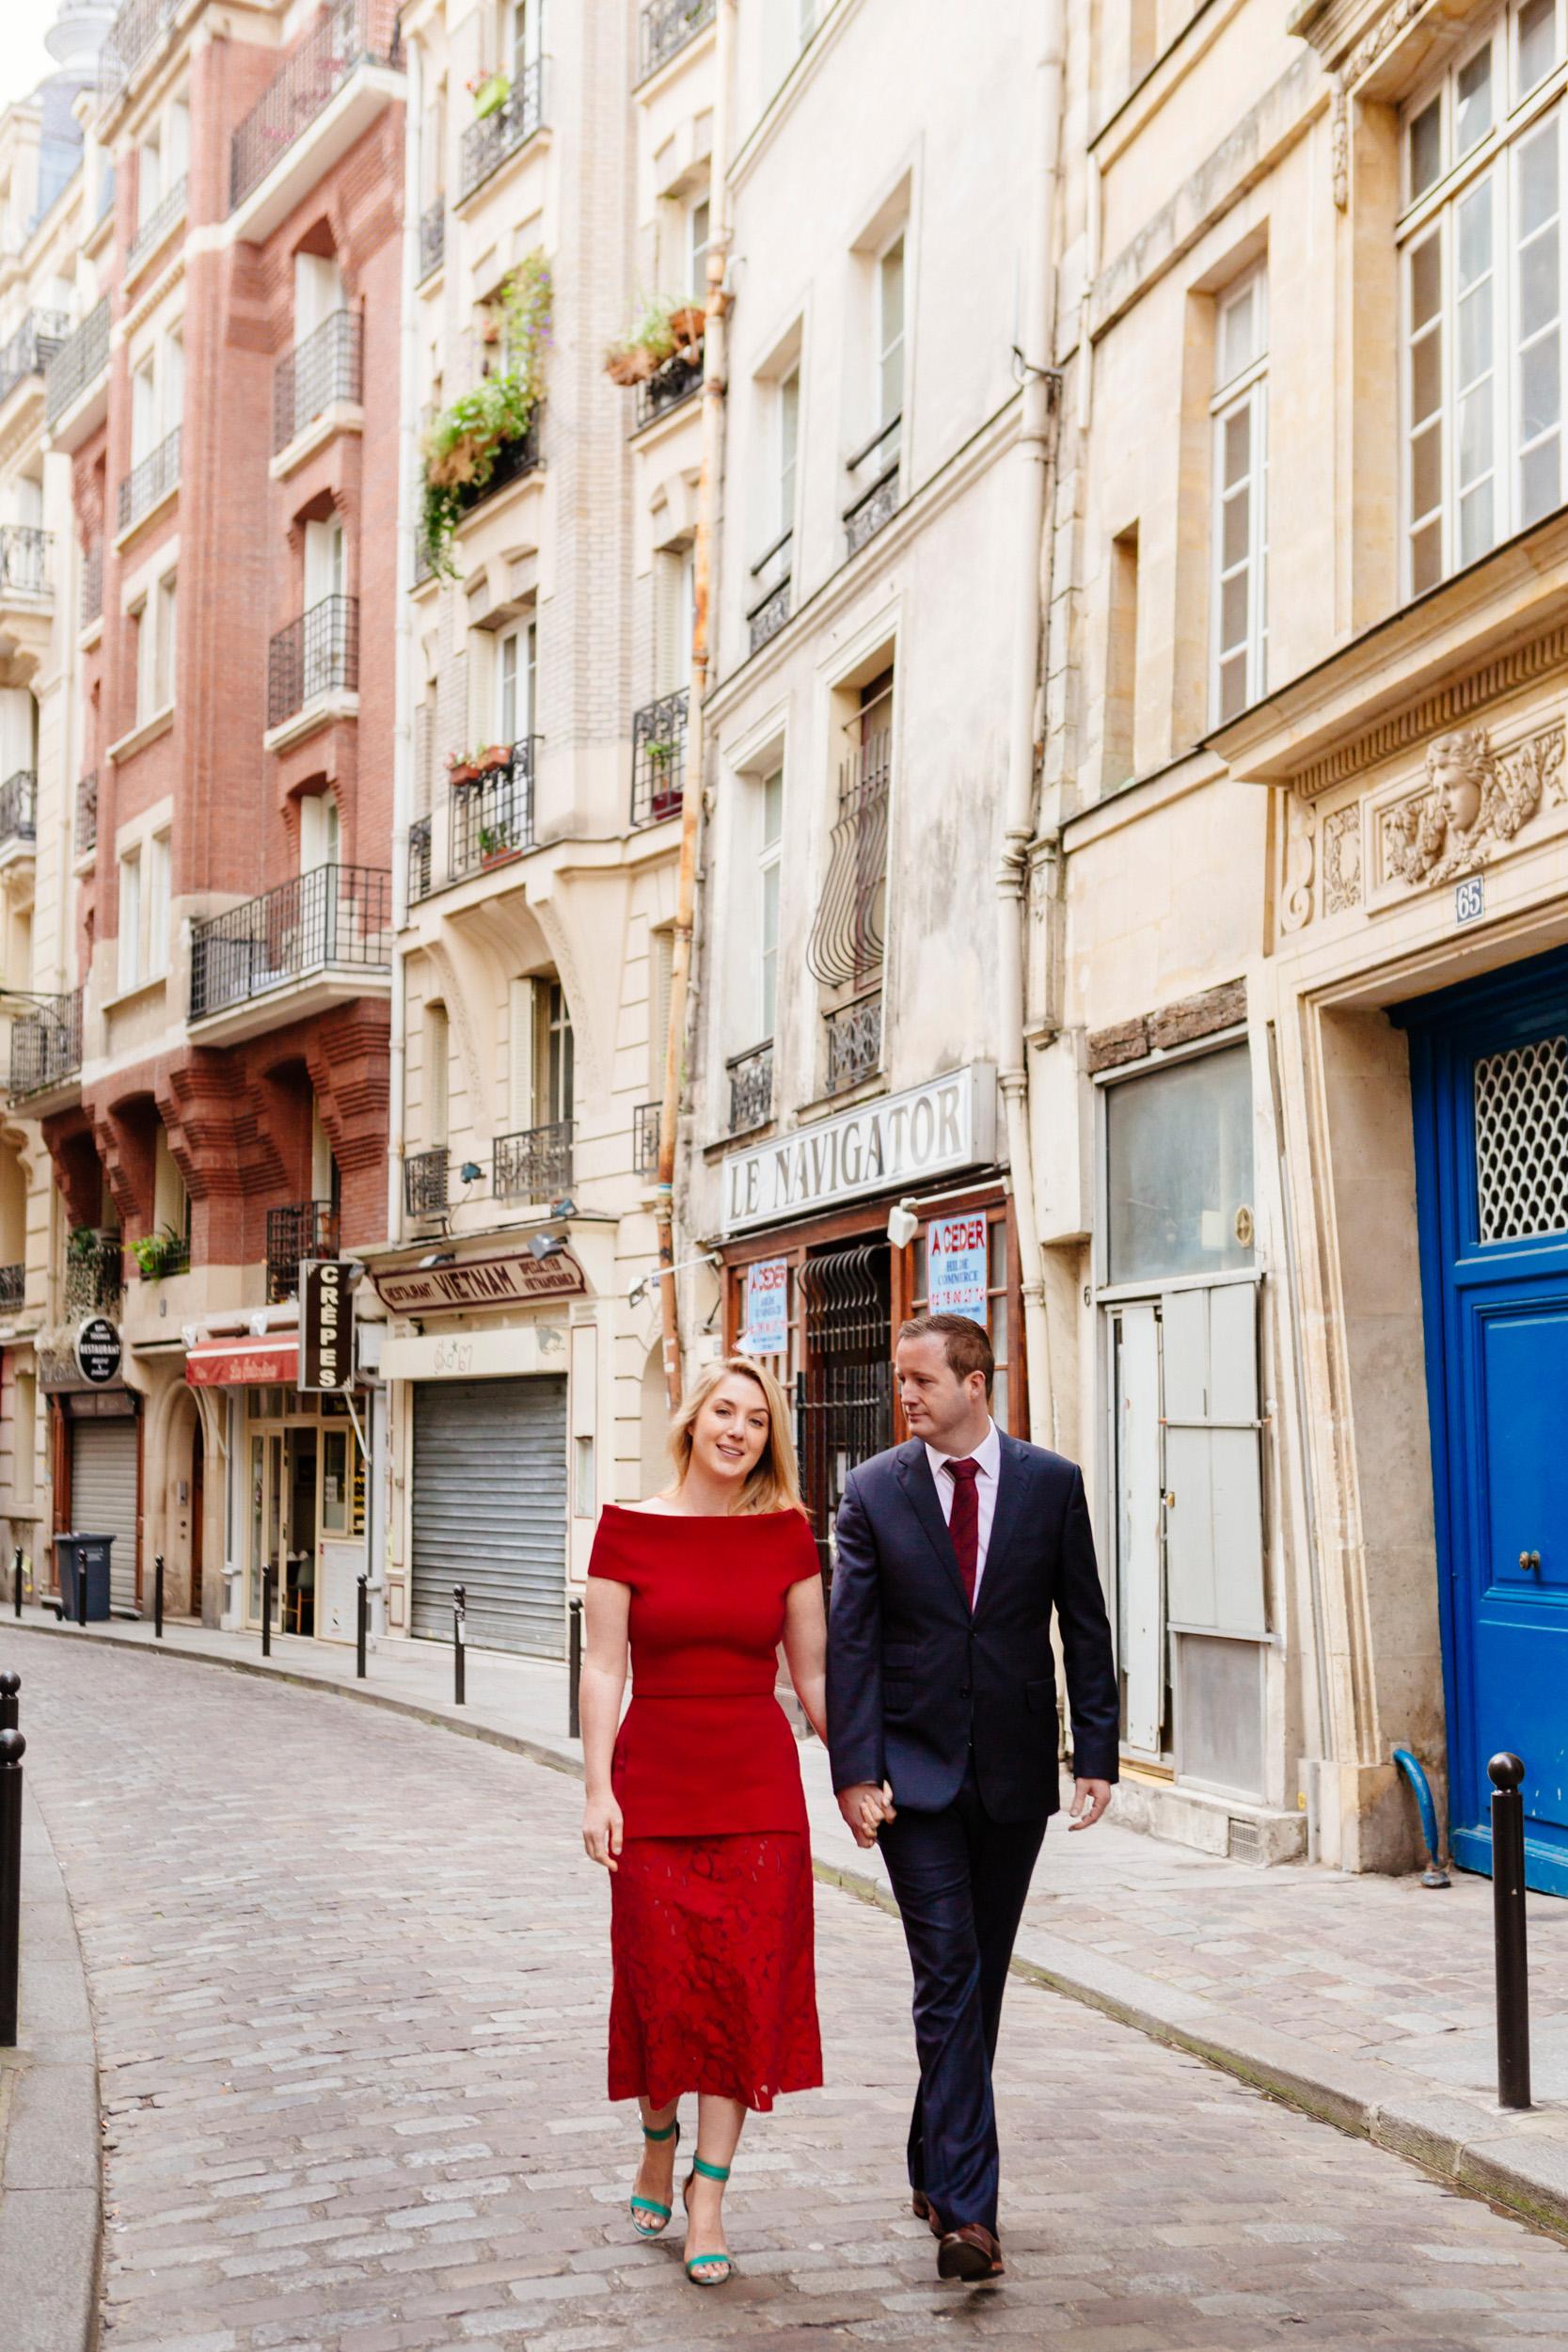 Romantic portrait of a couple walking through a typical Parisian street in Saint Germain captured by Paris Photographer Federico Guendel www.iheartparis.fr